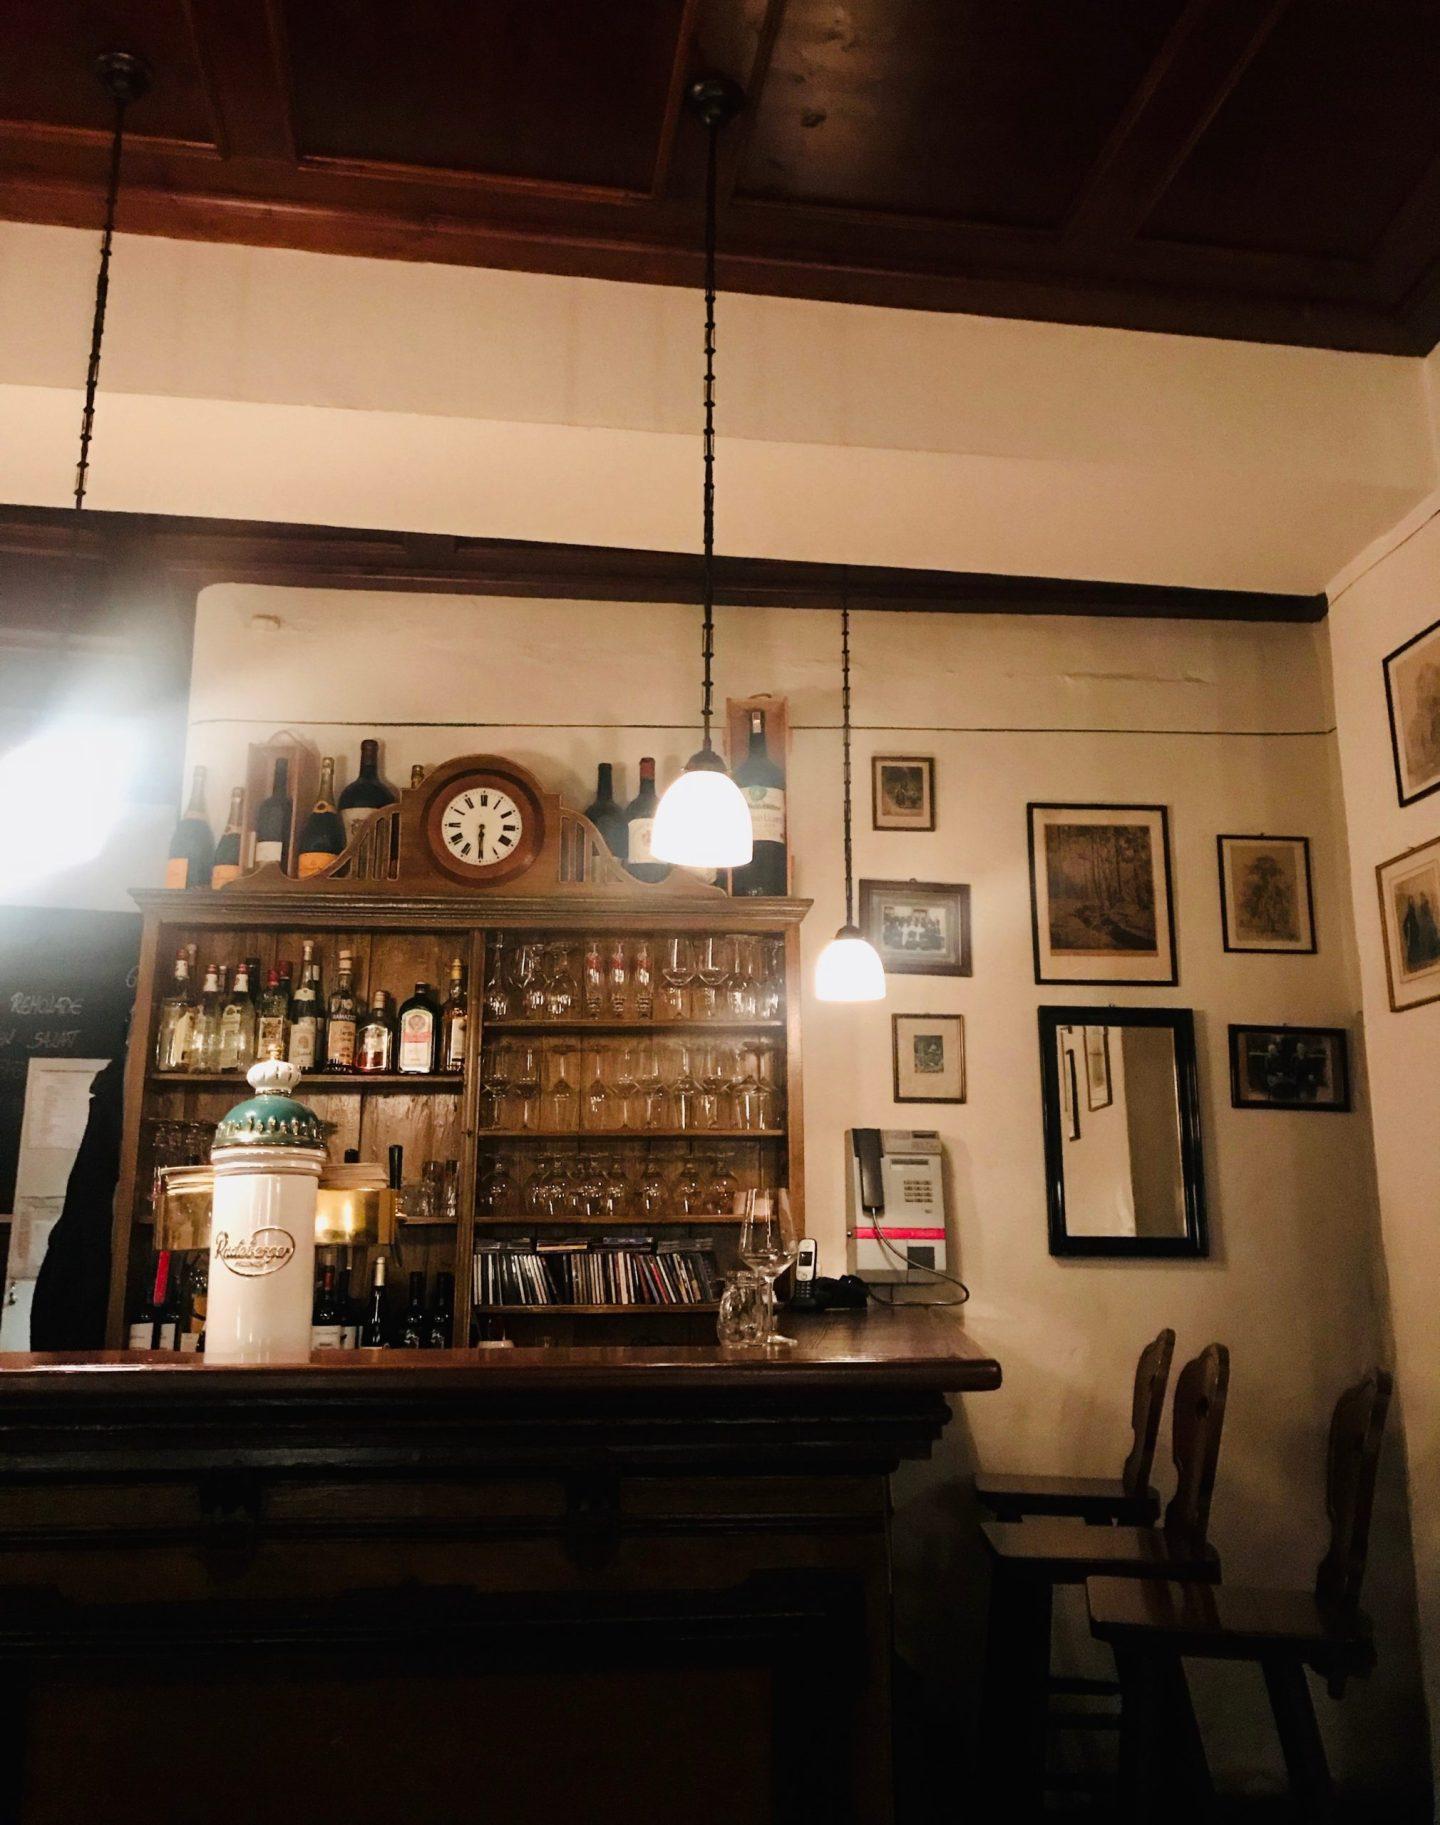 markstuebe – where to eat in heidelberg